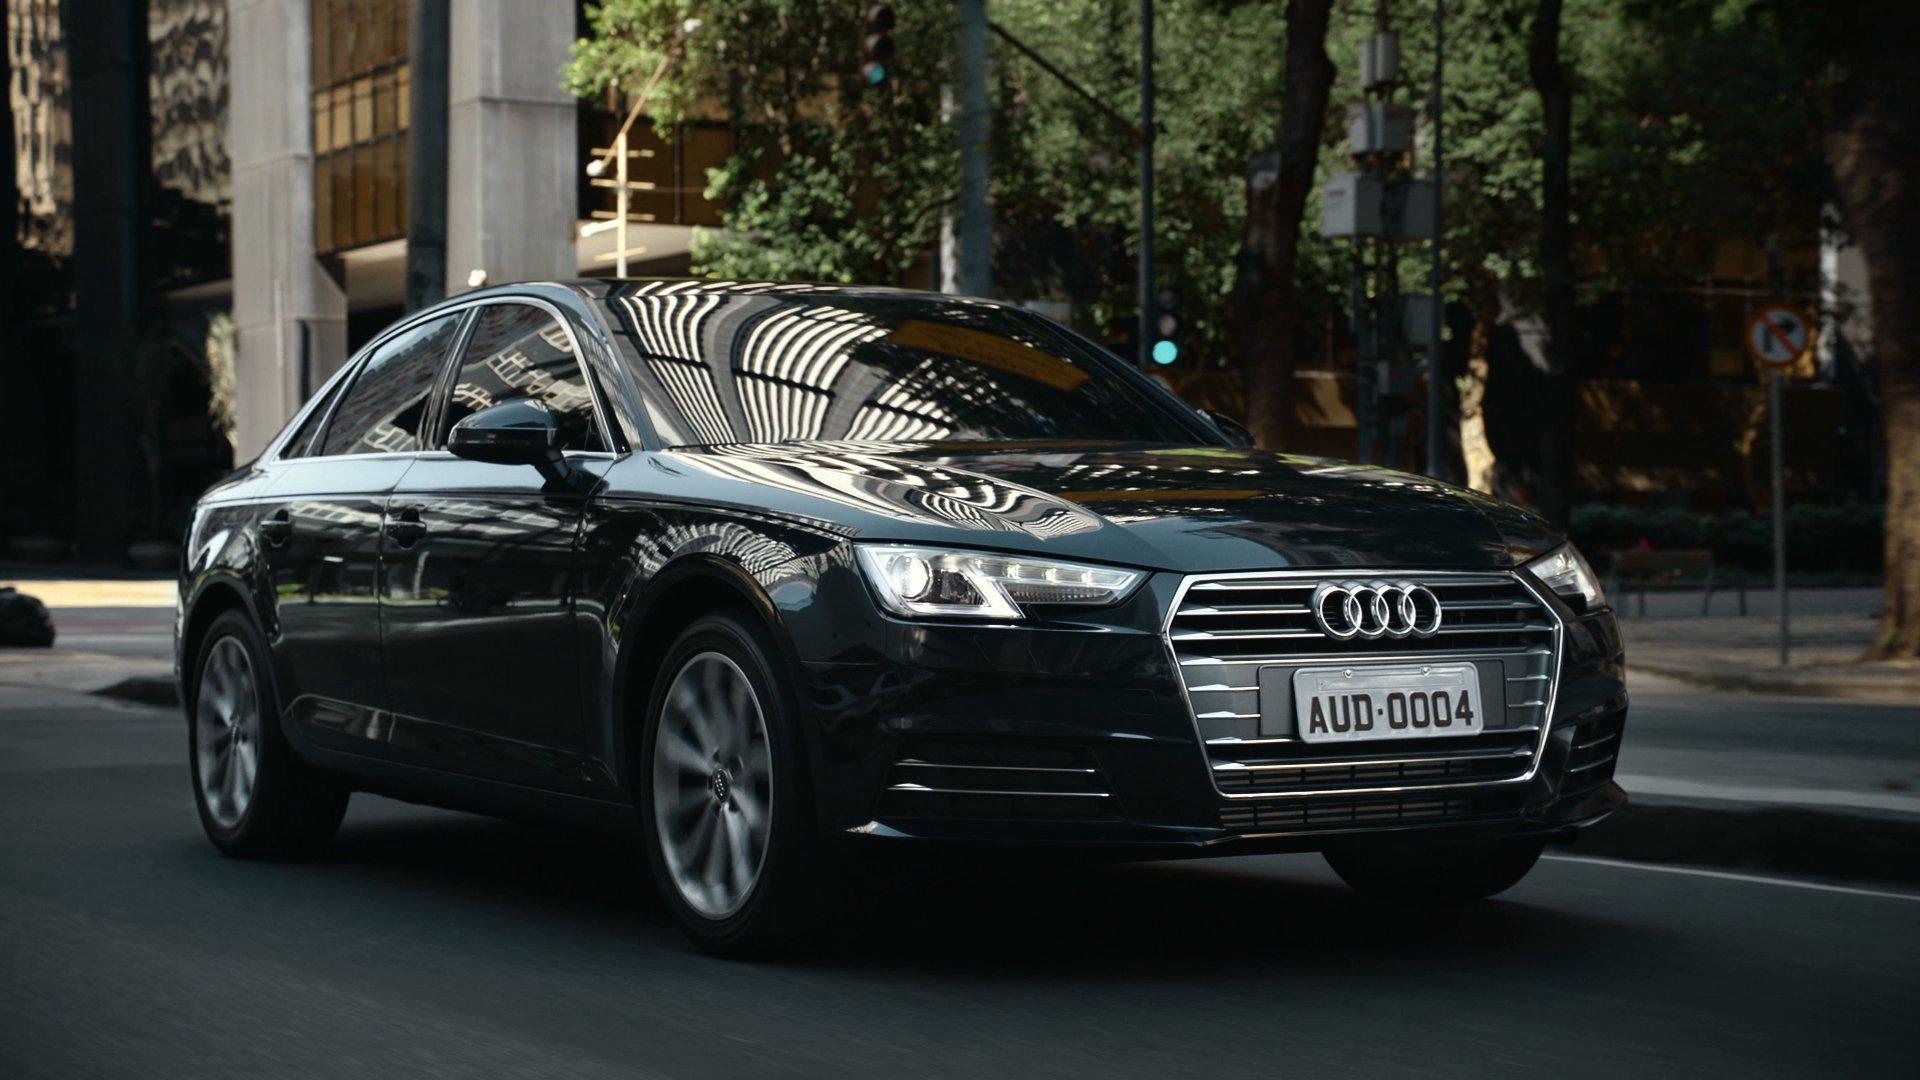 Comprove na Audi Center Teresina todos os atributos do Audi A4: é dirigir e querer!